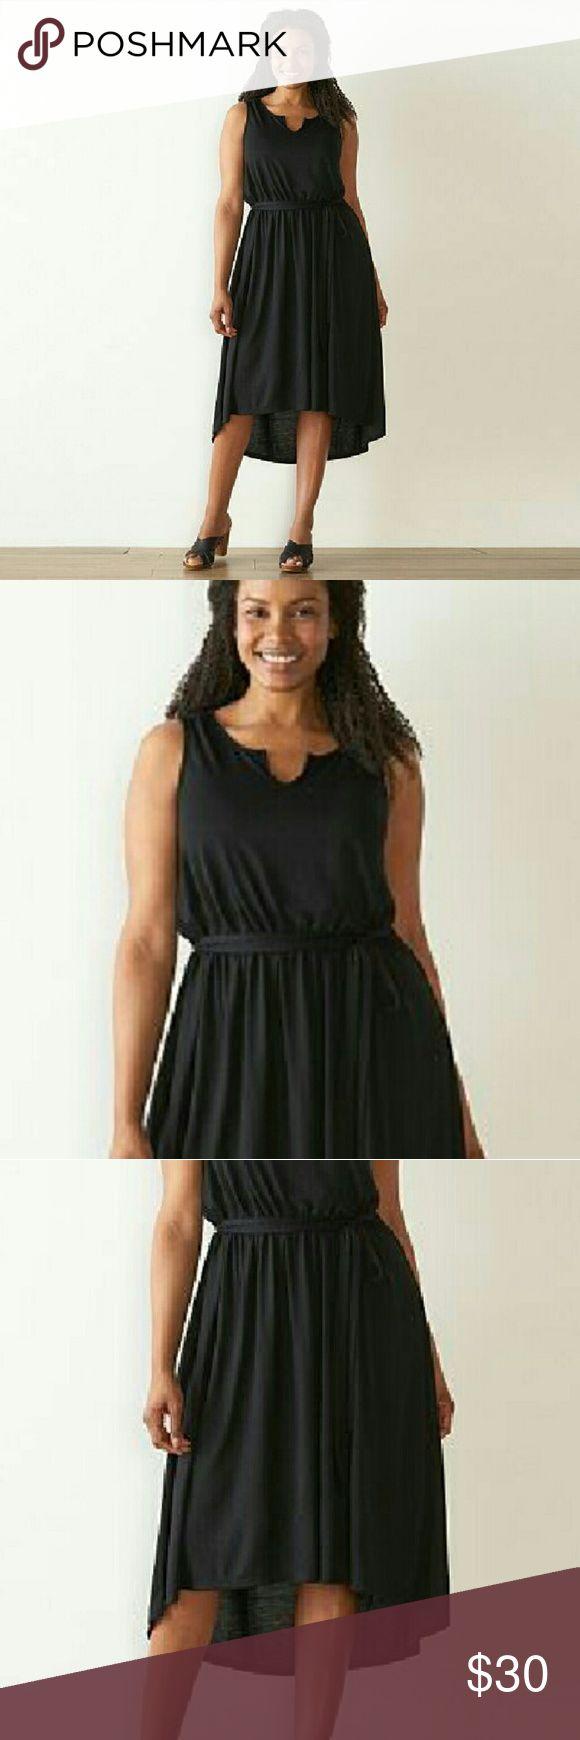 Plus Size Sonoma  Black High Low Dress Sonoma size 2X  Black Jersey Maxi . Has split neck detail, high low hemline  maxi  dress. Has  elastici waist & comes w/ tie belt. NWT    $30 Sonoma Dresses High Low